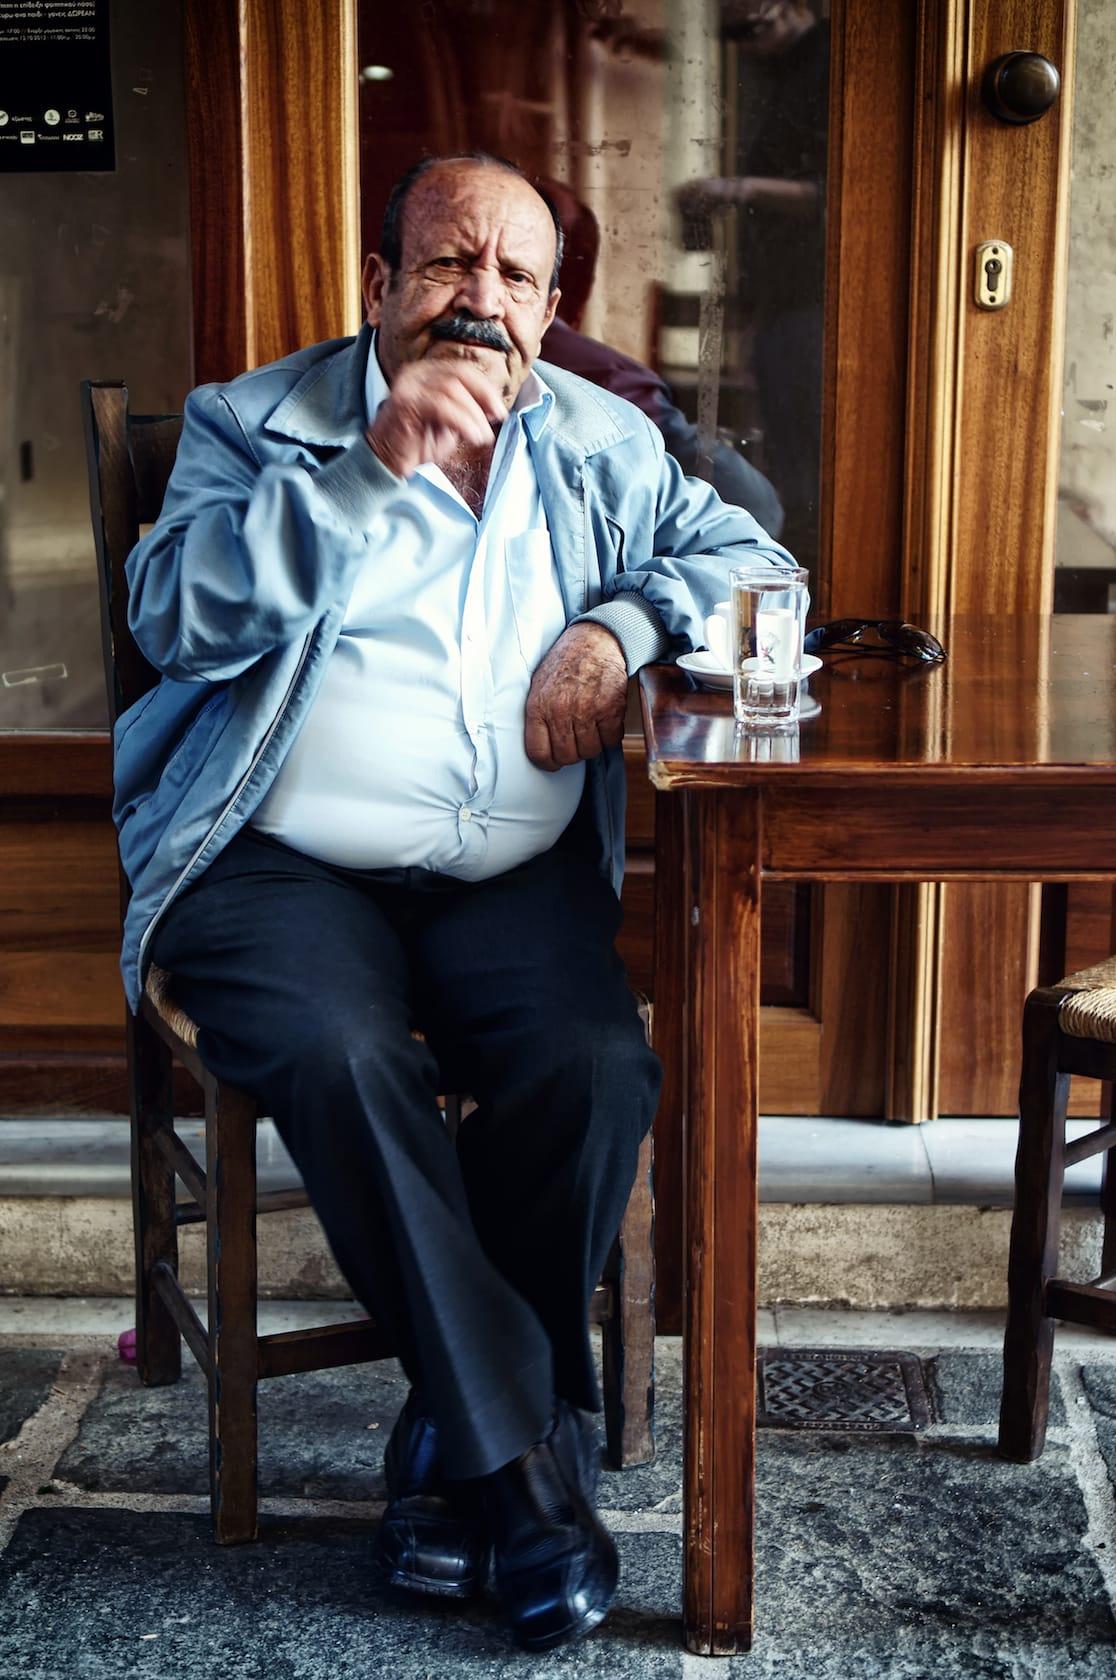 Morning Greek coffee